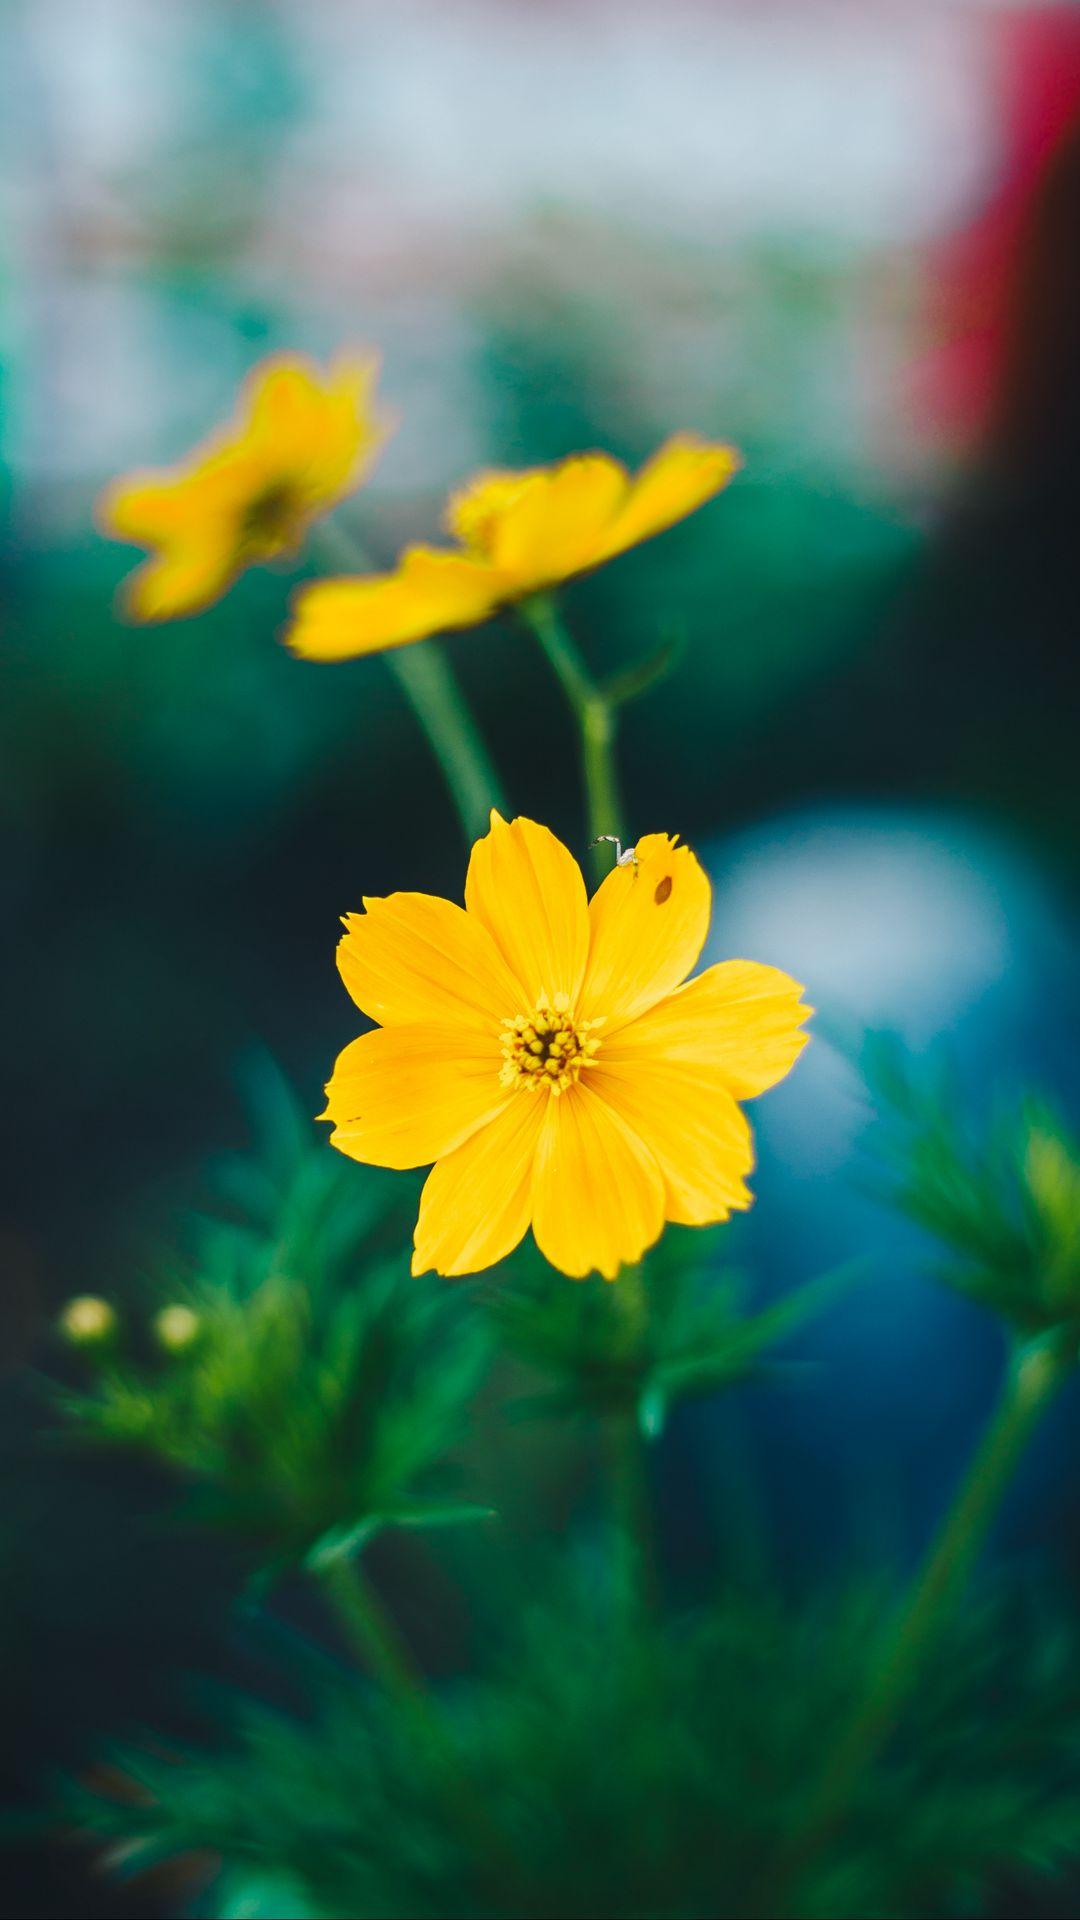 1080x1920 Wallpaper cosmos, field flower, blur